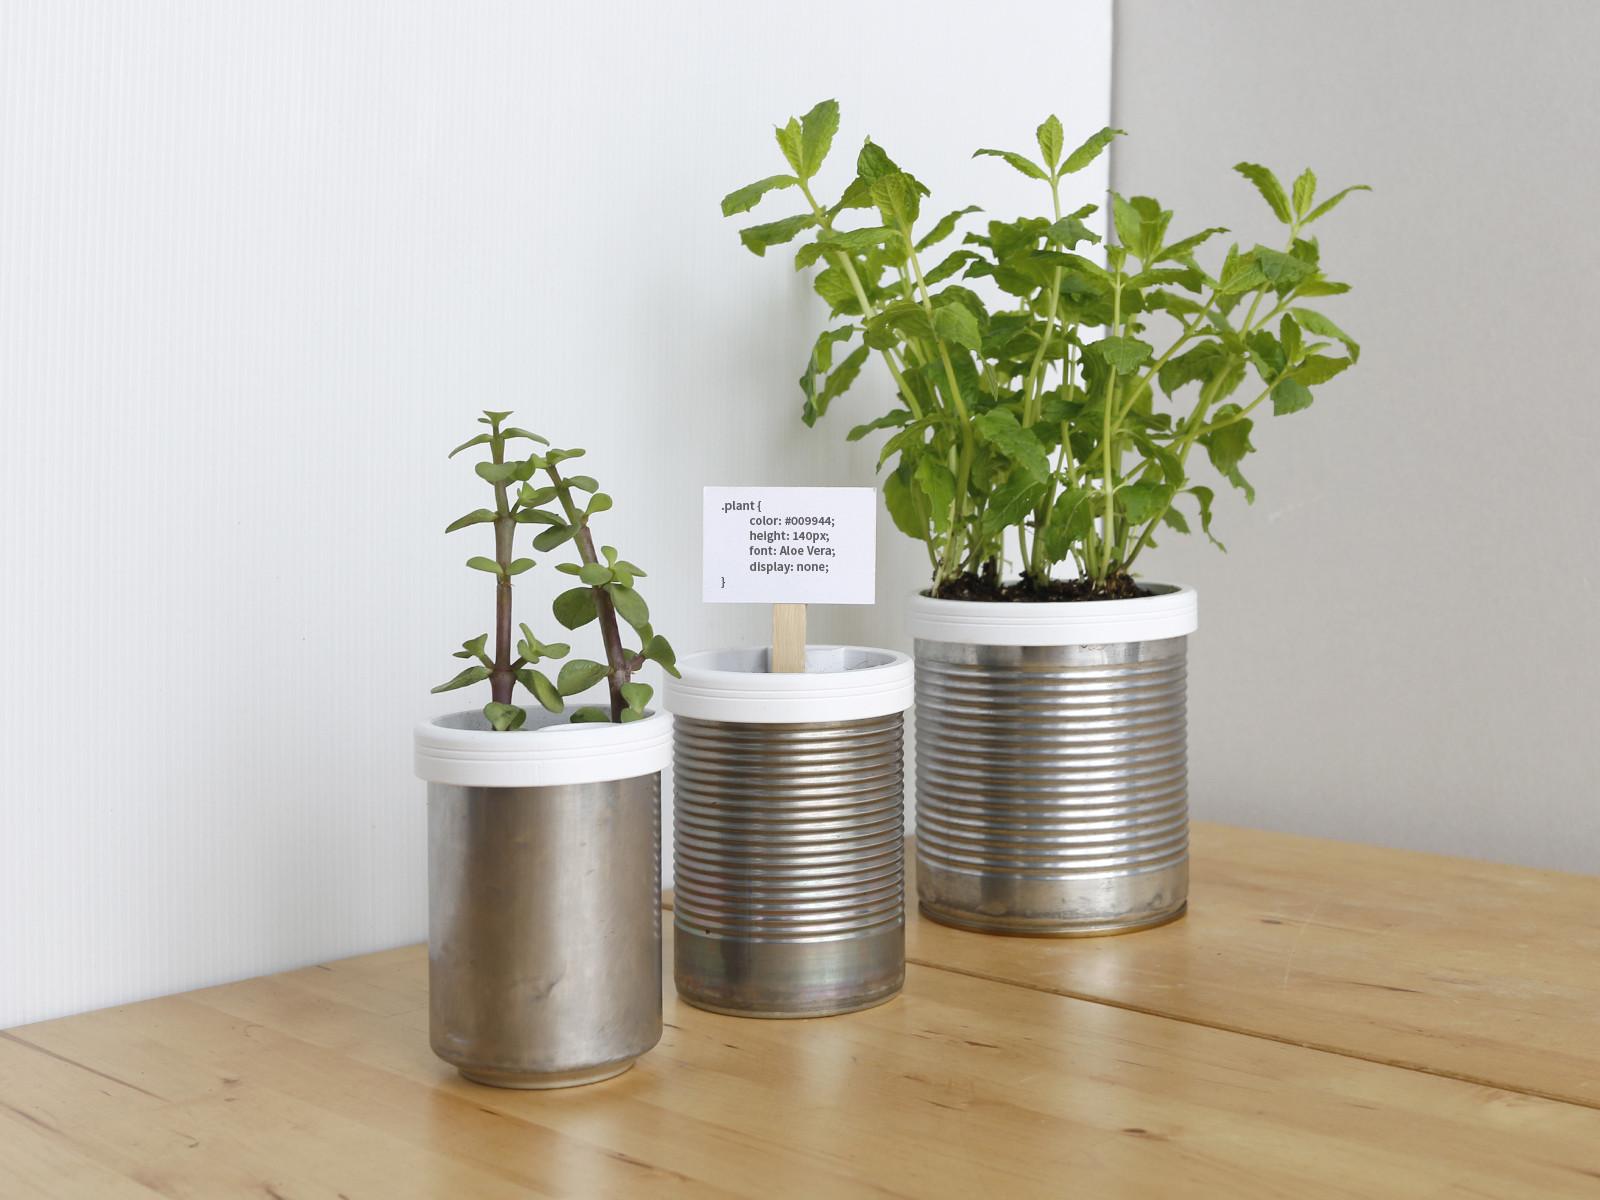 watering can vase metal of campbell planter fully 3d printed self watering planter by inside by flowalistik jun 14 2016 view original